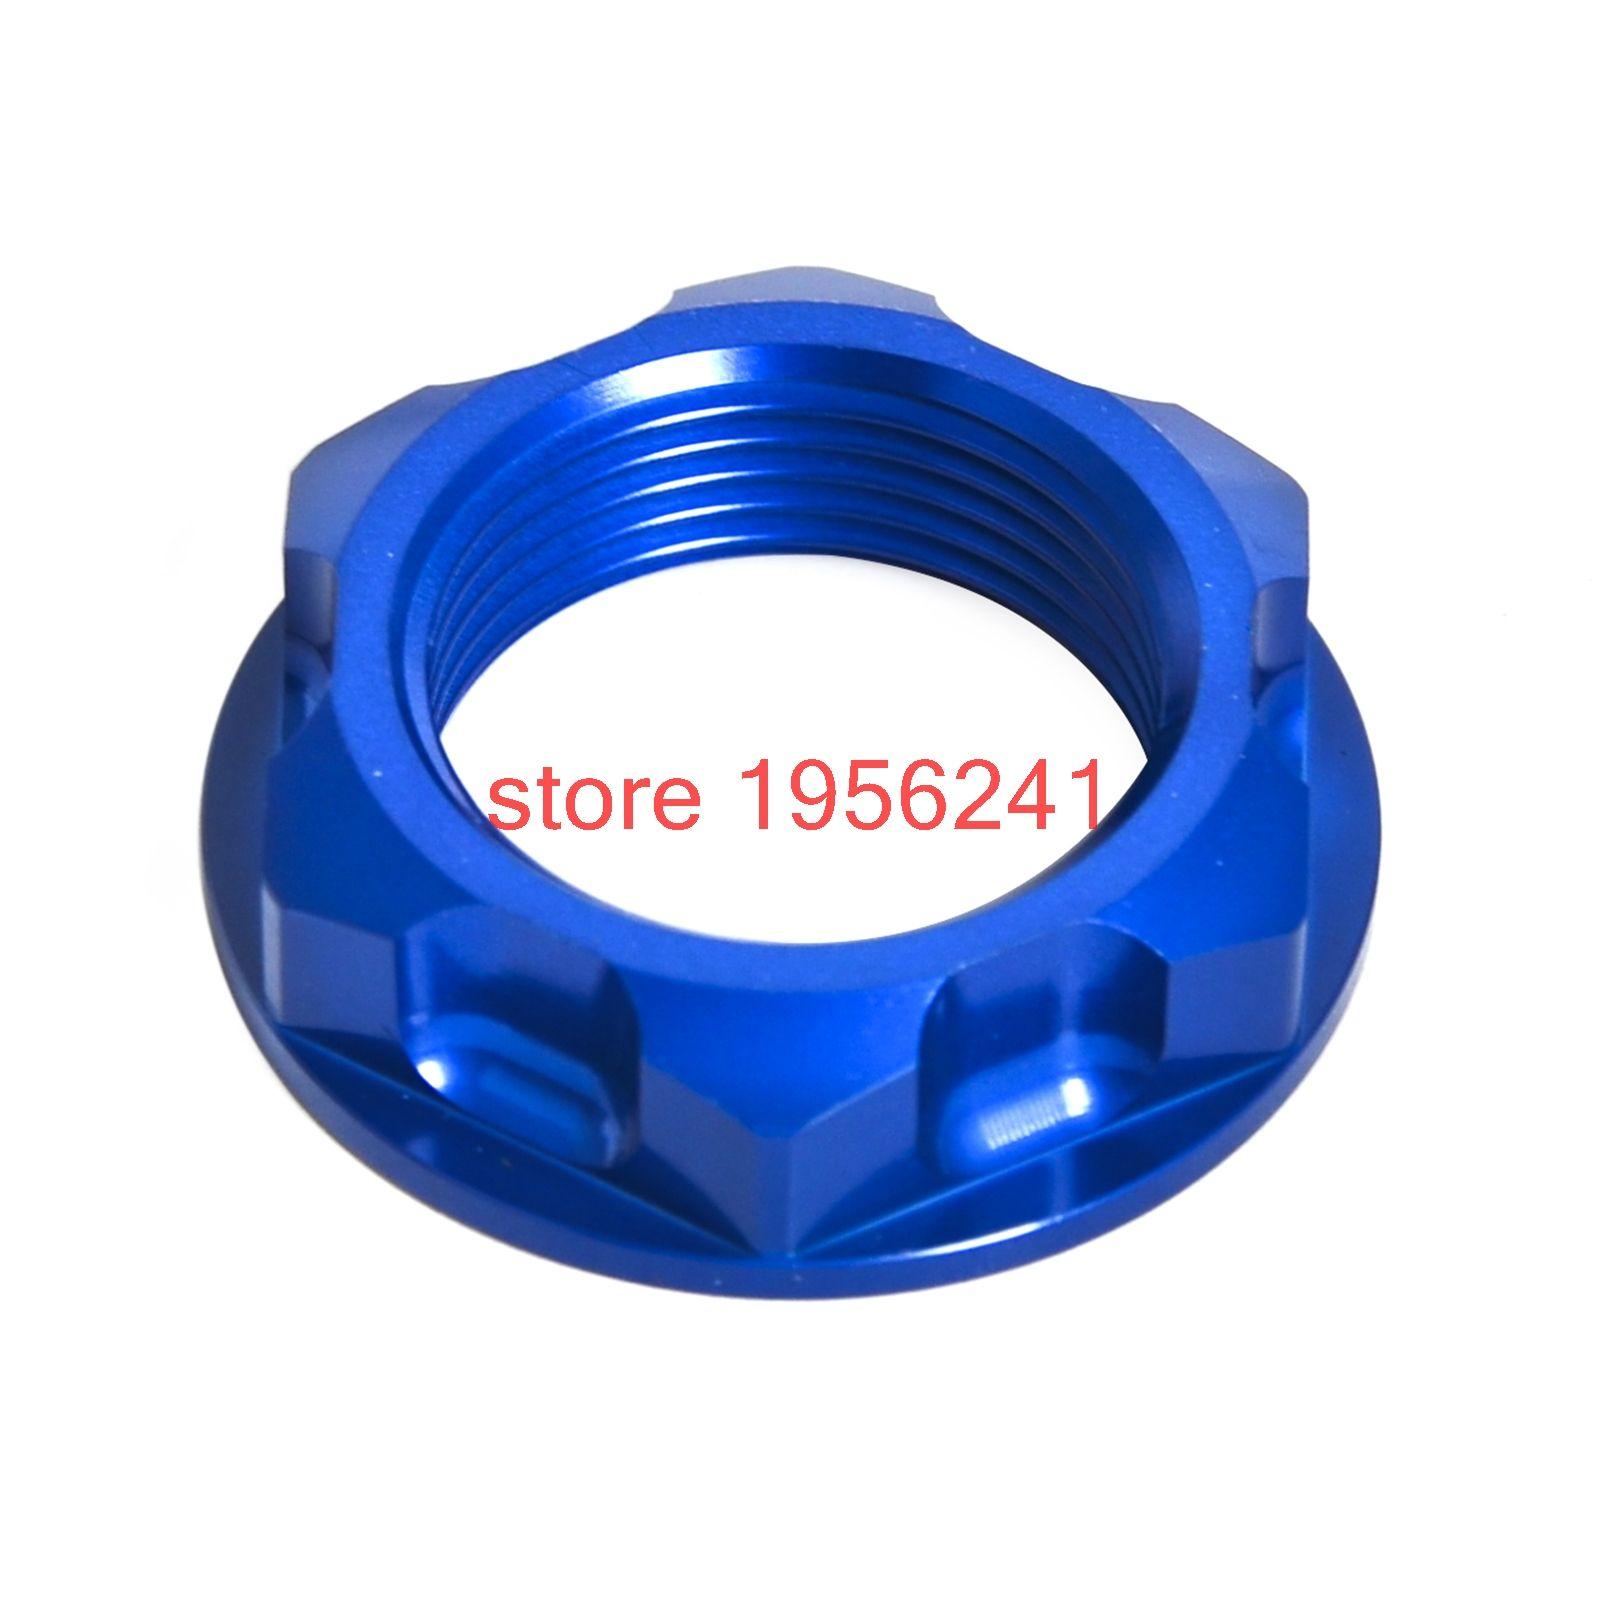 Motorcycle Steering Stem Nut For Yamaha TT250R 1993-1997 WR250R WR250X  WR250 R/X 2007-2017